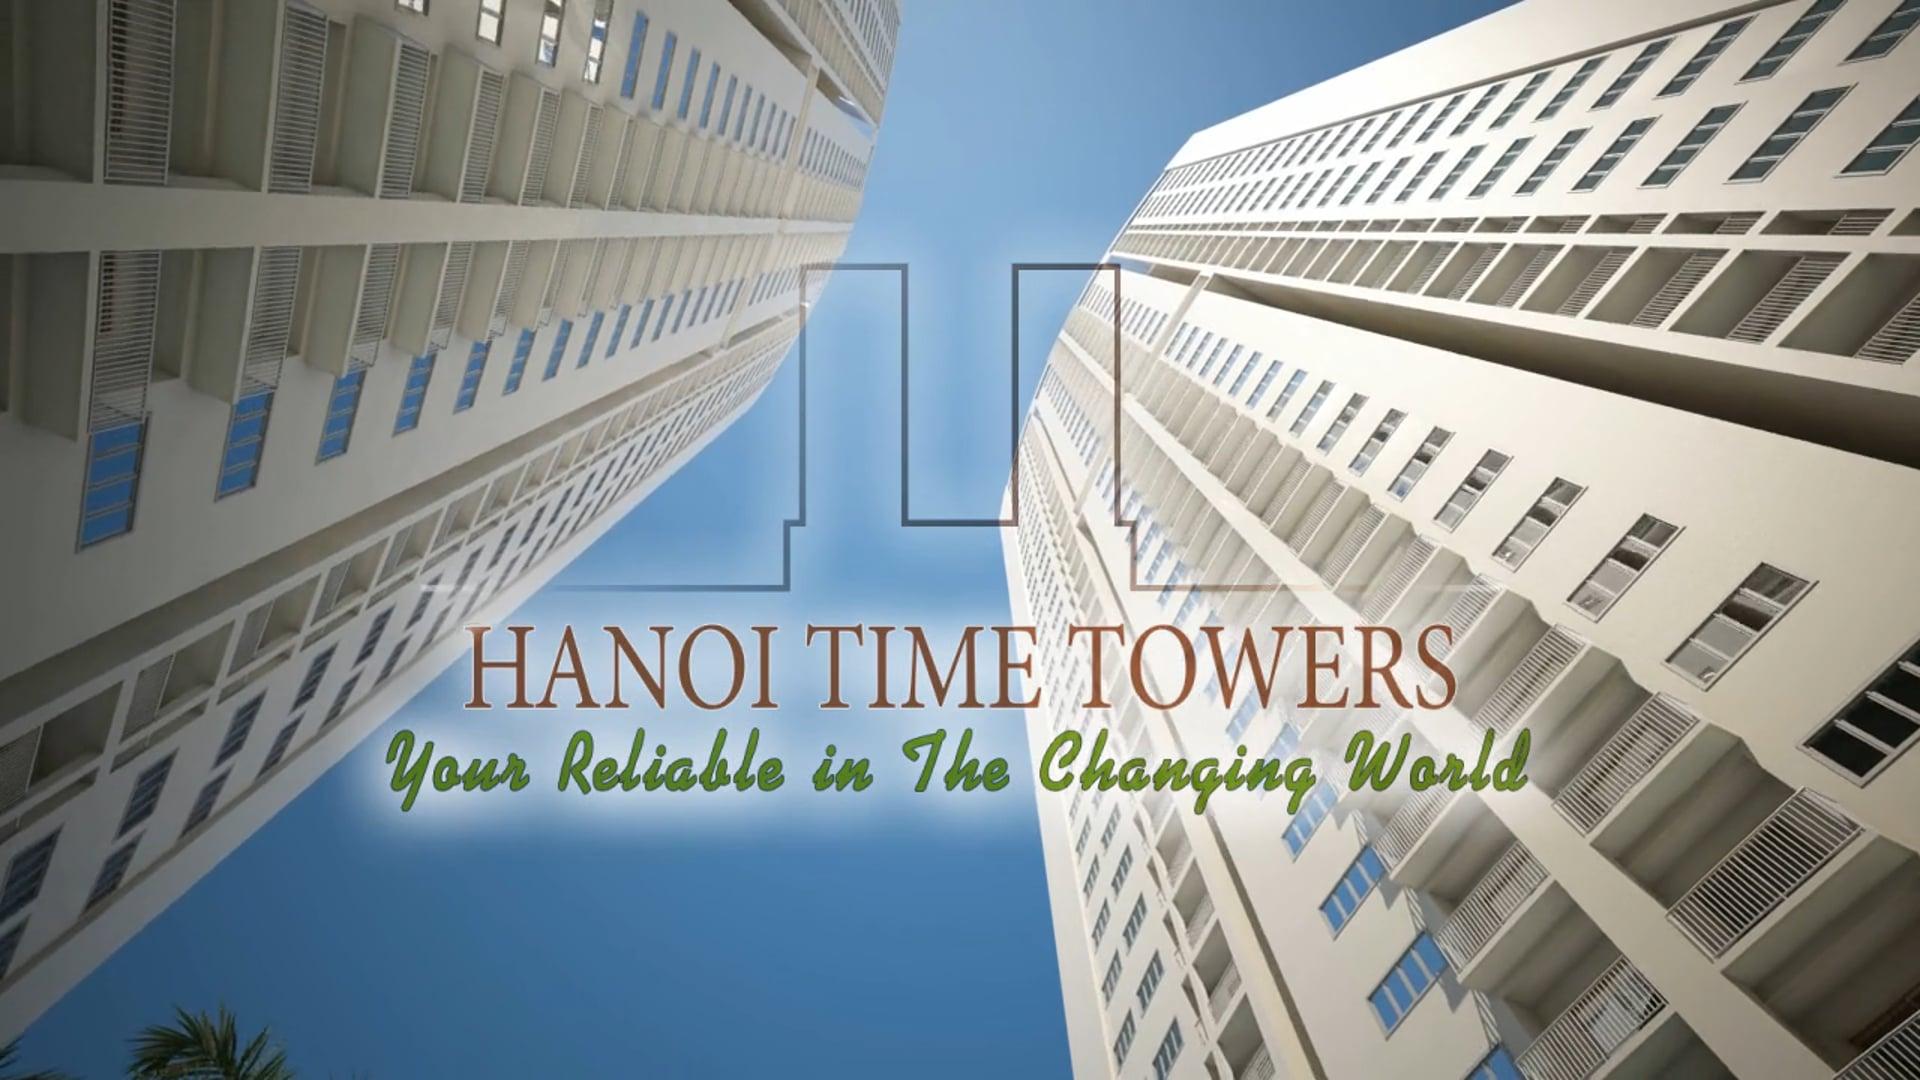 Time tower Hanoi 2011